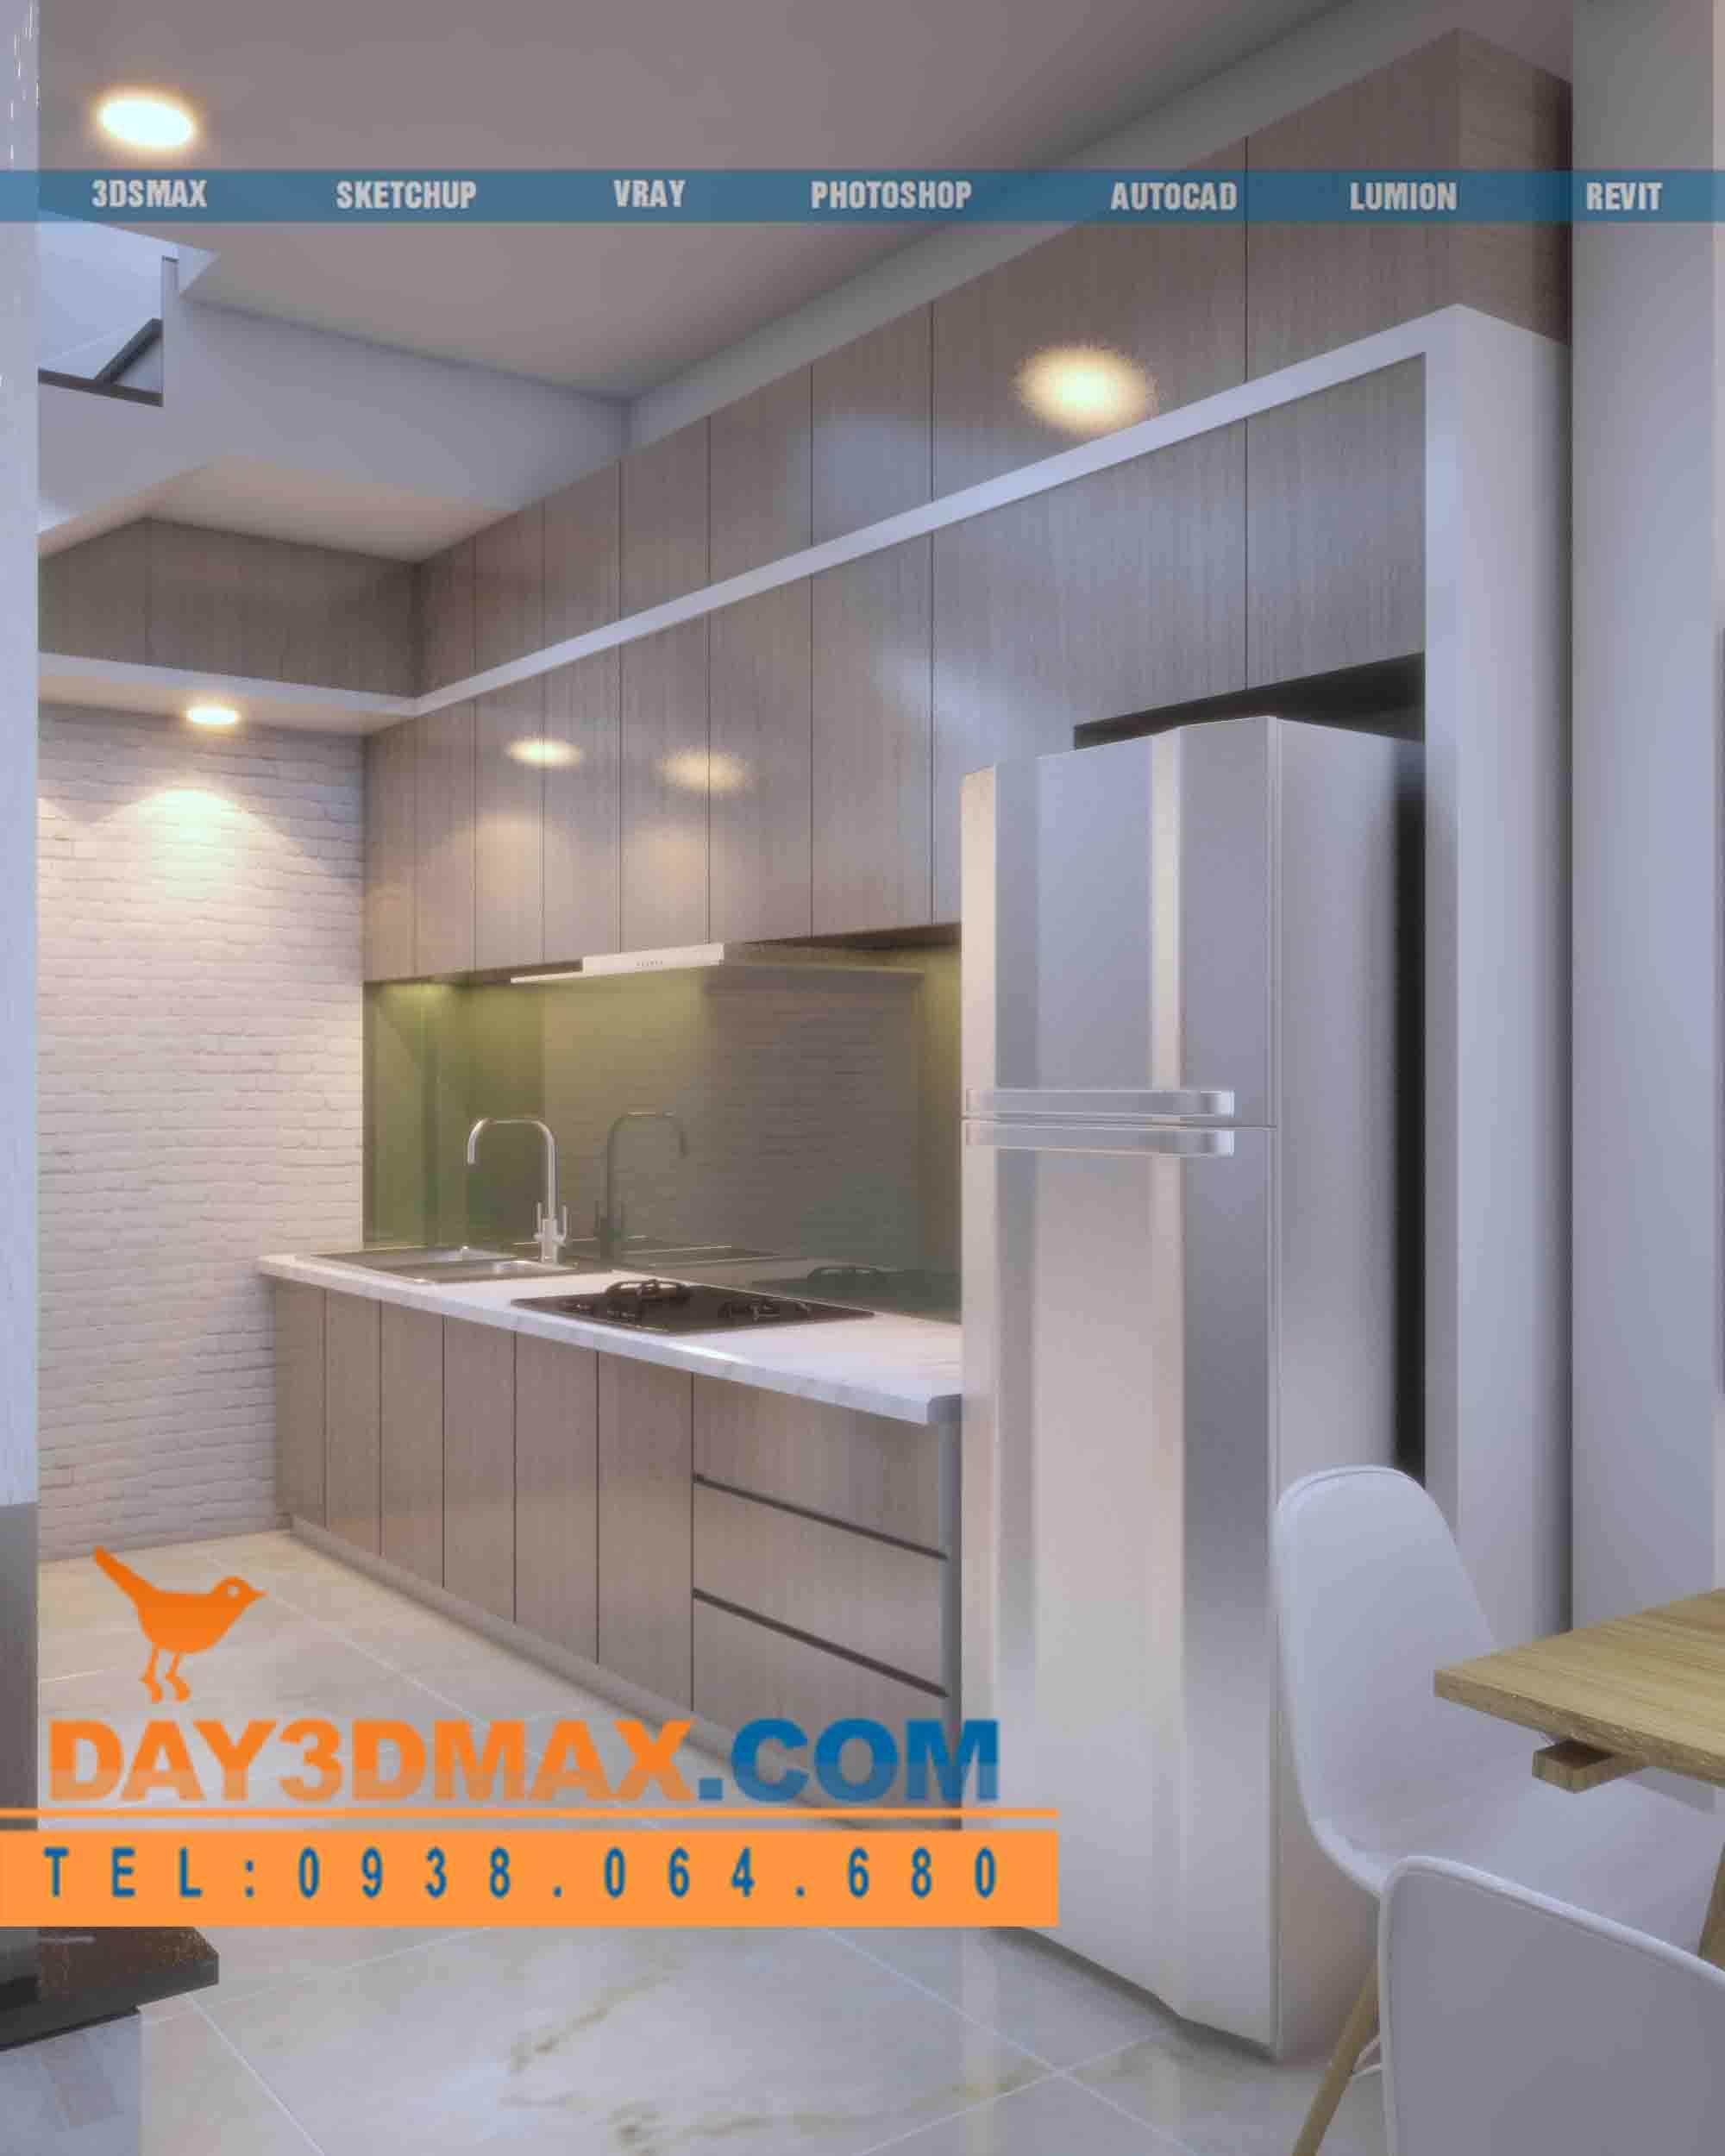 Online 3d Course Render An Interior Of A Kitchen